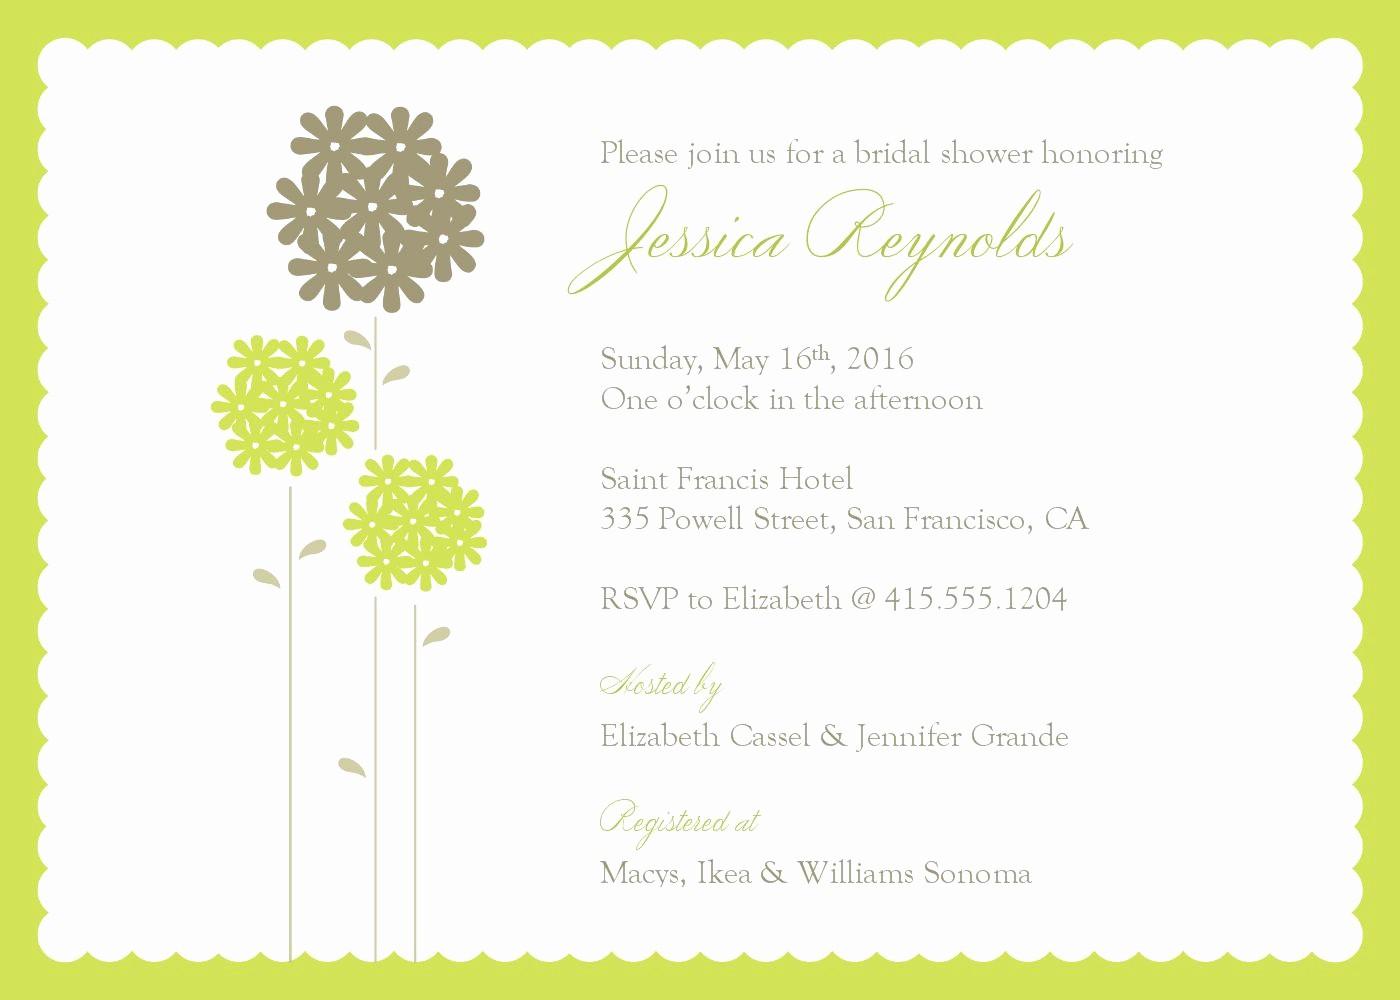 Wedding Invitation Template Word Free Beautiful Invitation Word Templates Free Wedding Invitation Word